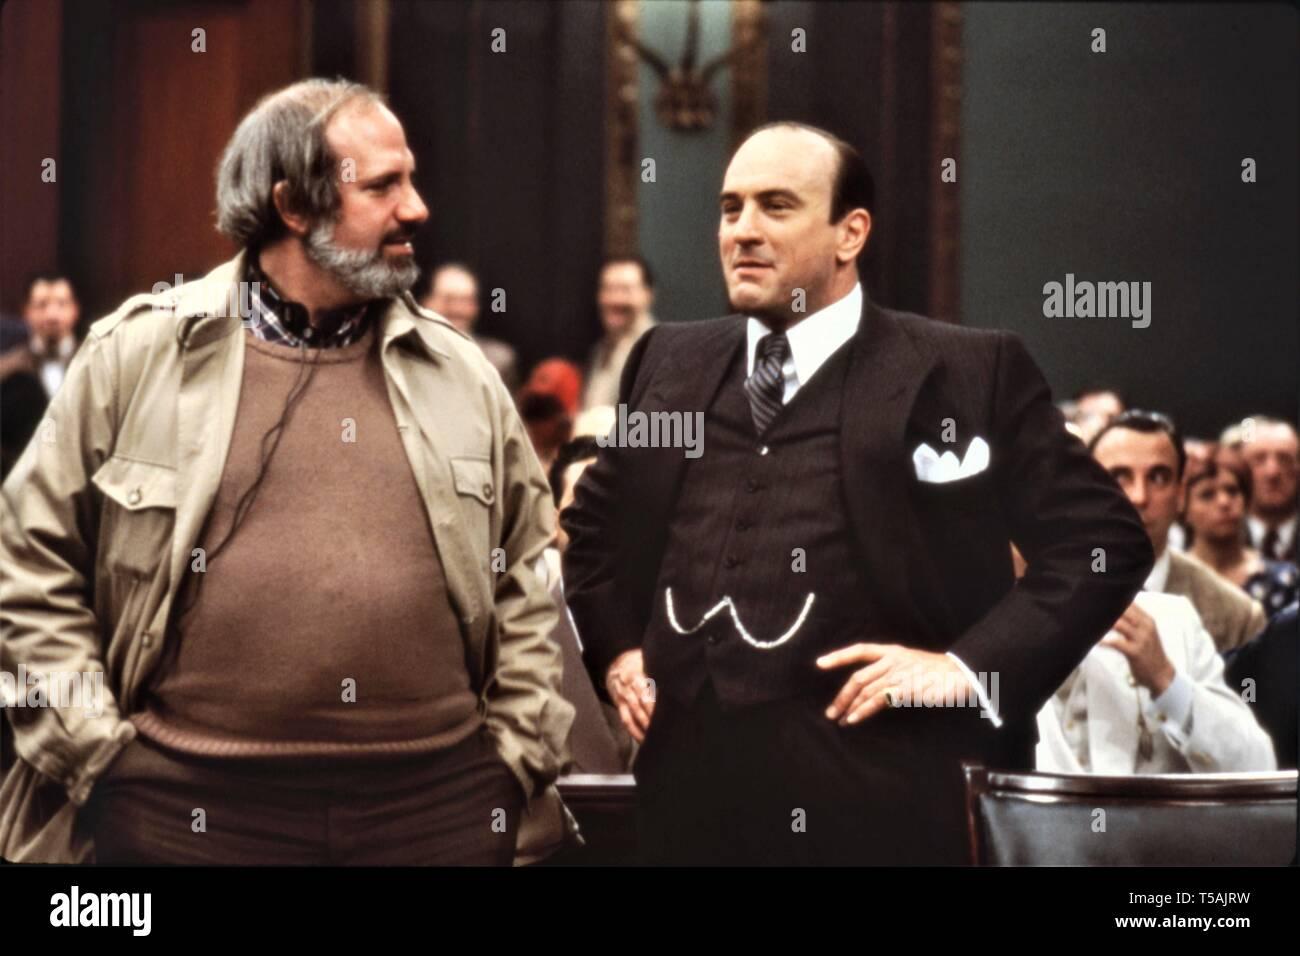 Director Brian De Palma actor Robert De Niro as Al Capone THE UNTOUCHABLES 1987 on set candid filming Paramount Pictures - Stock Image